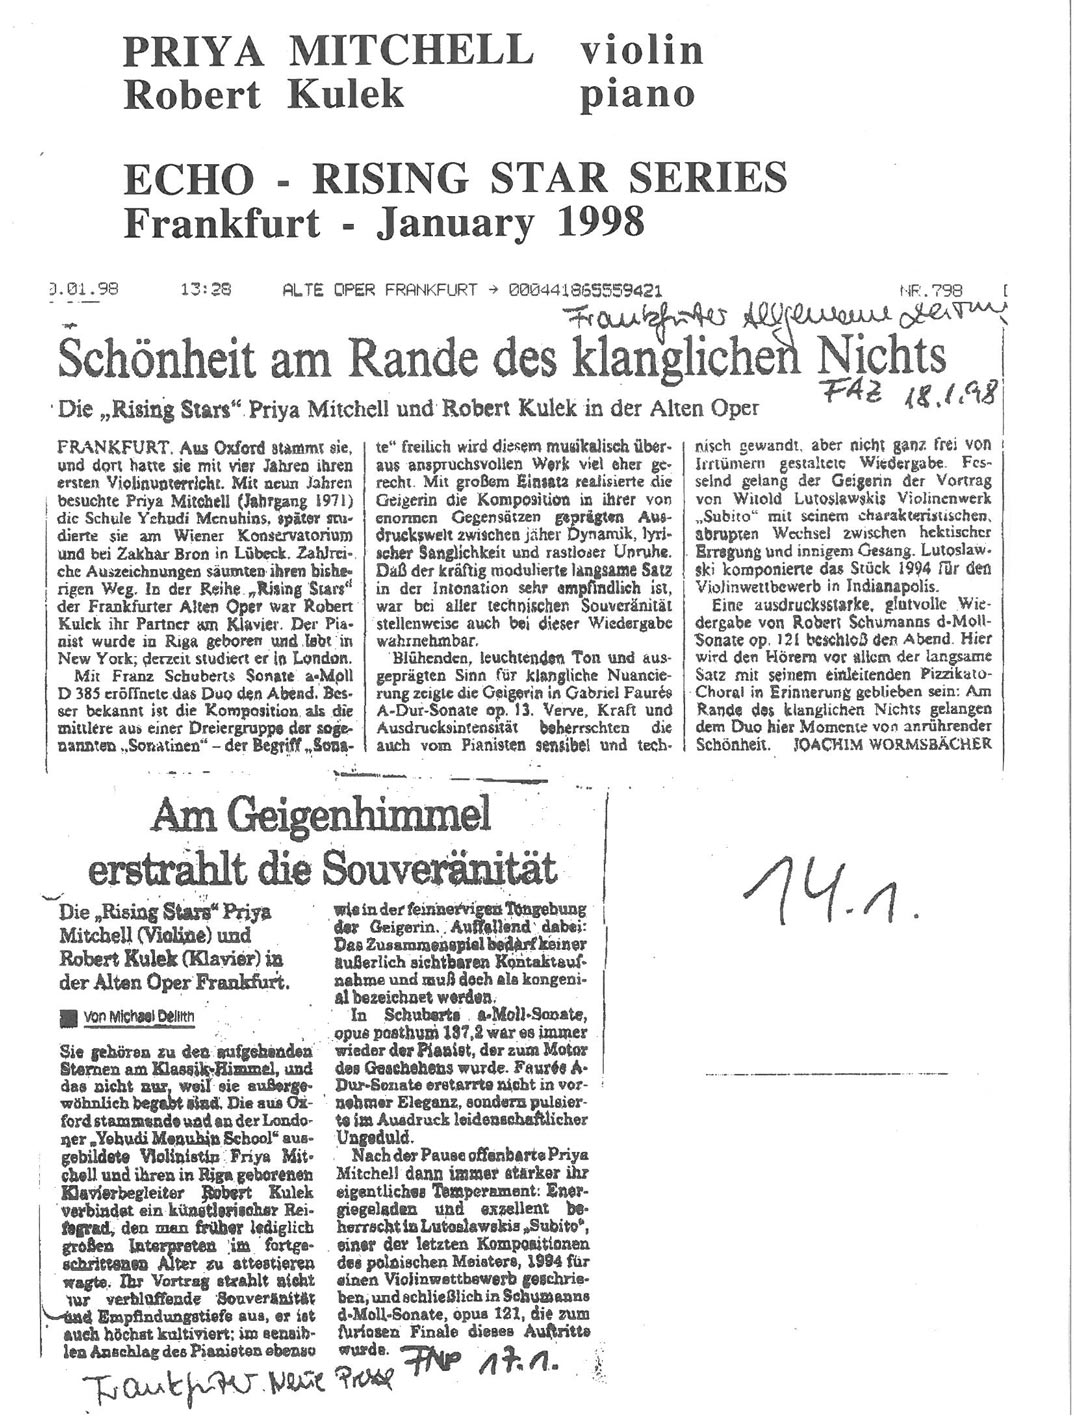 Review, 1998, ECHO Rising Star Series